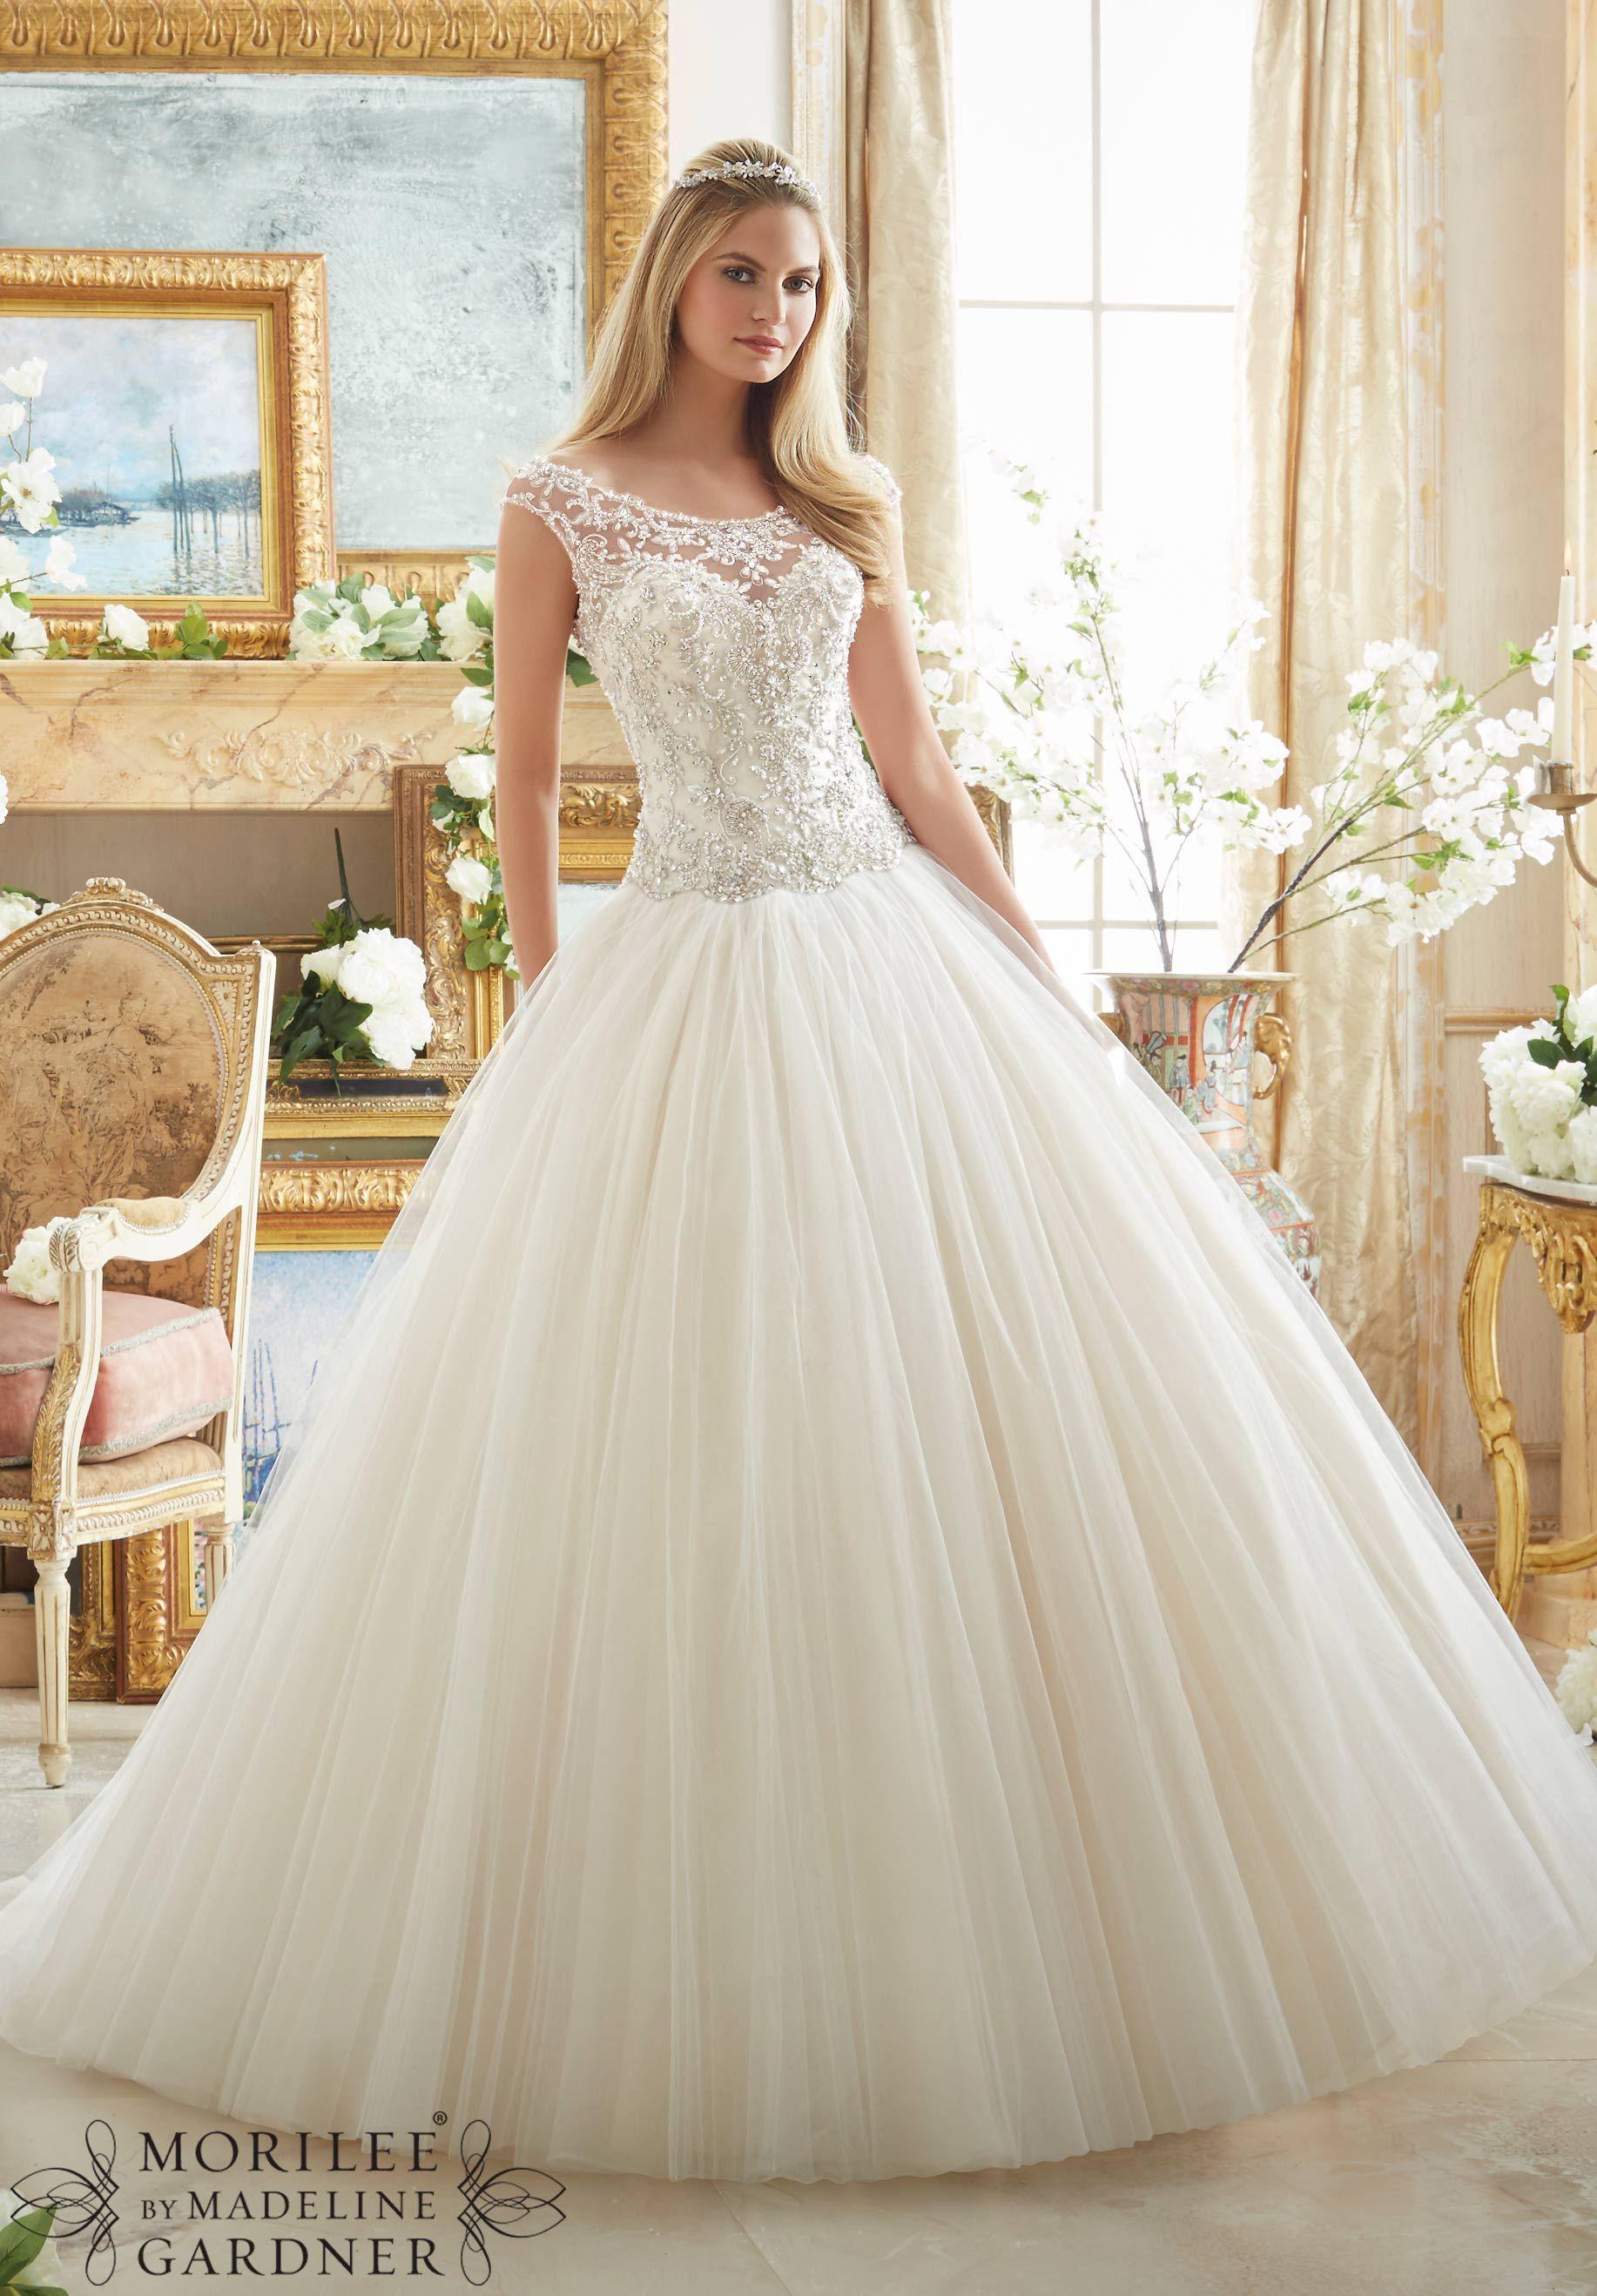 View Dress - Mori Lee Bridal FALL 2016 Collection: 2884 - Crystal ...